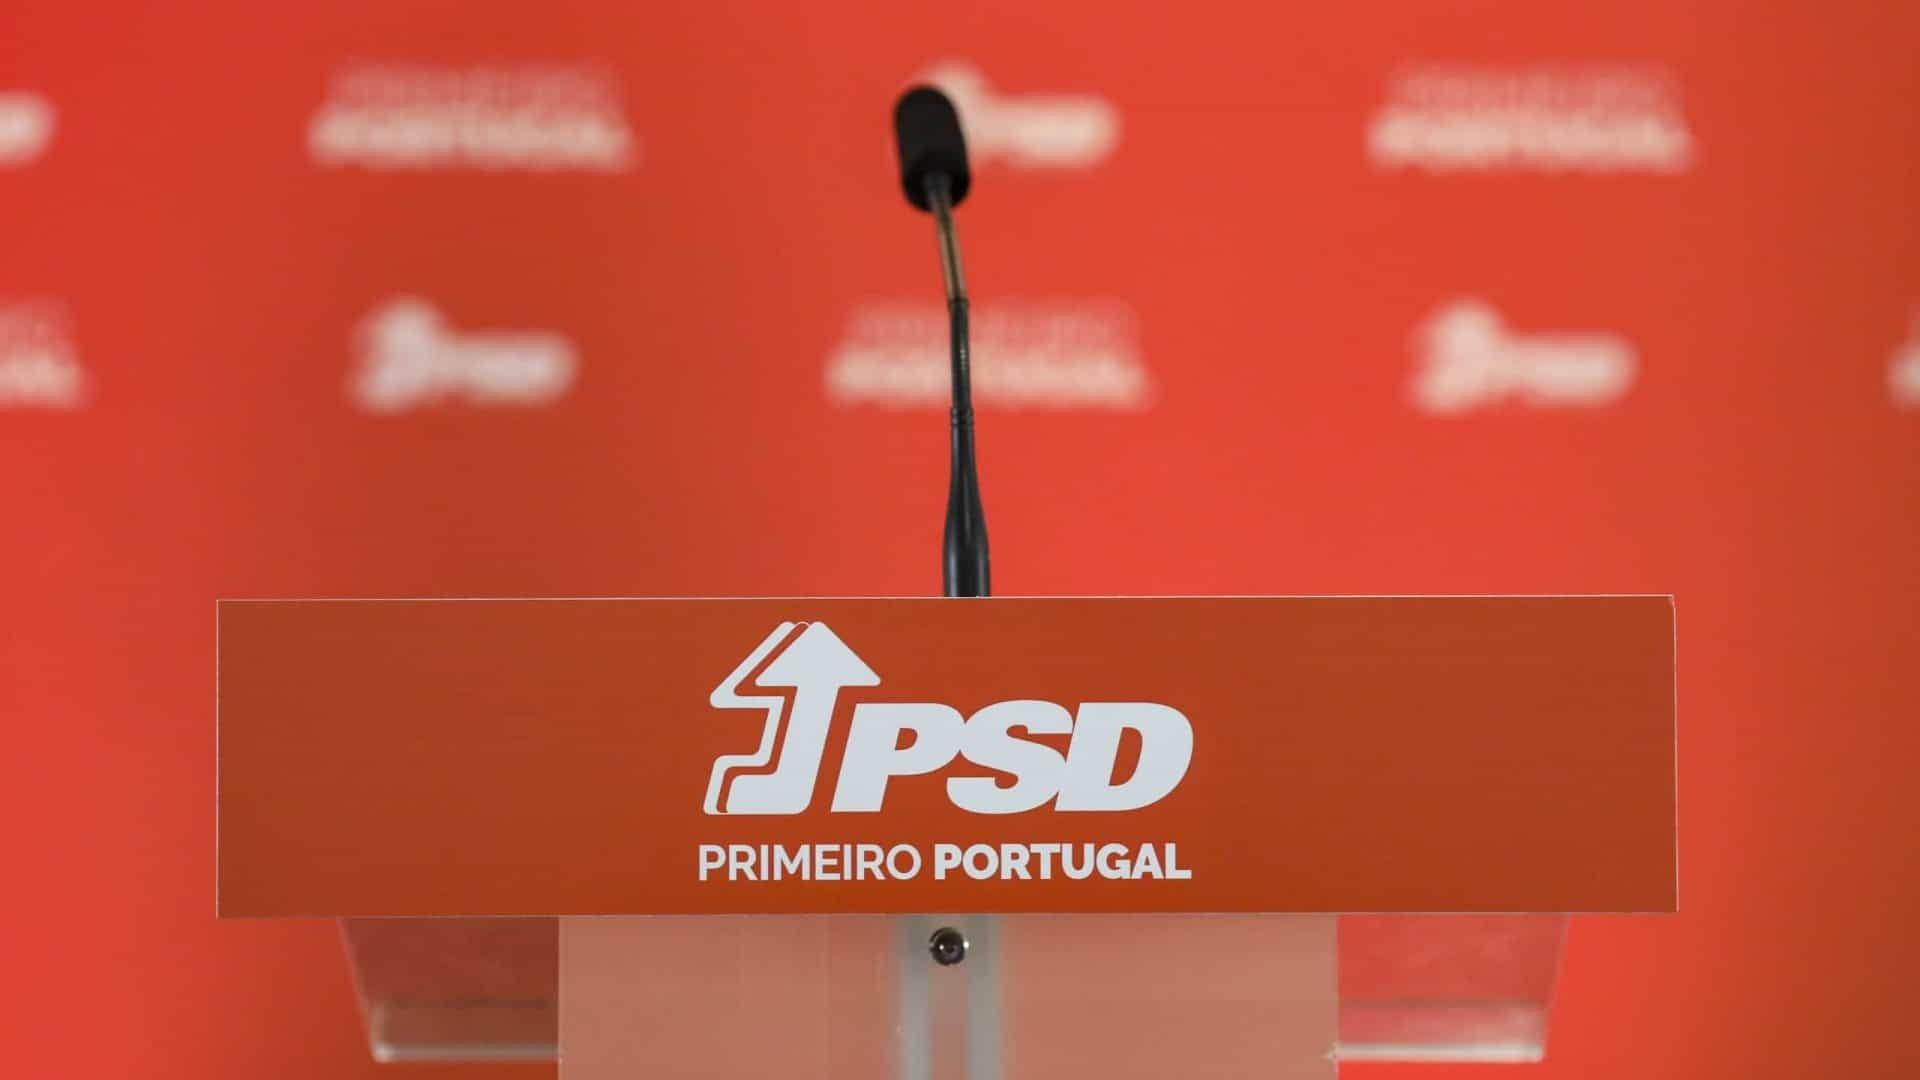 PSD bancada